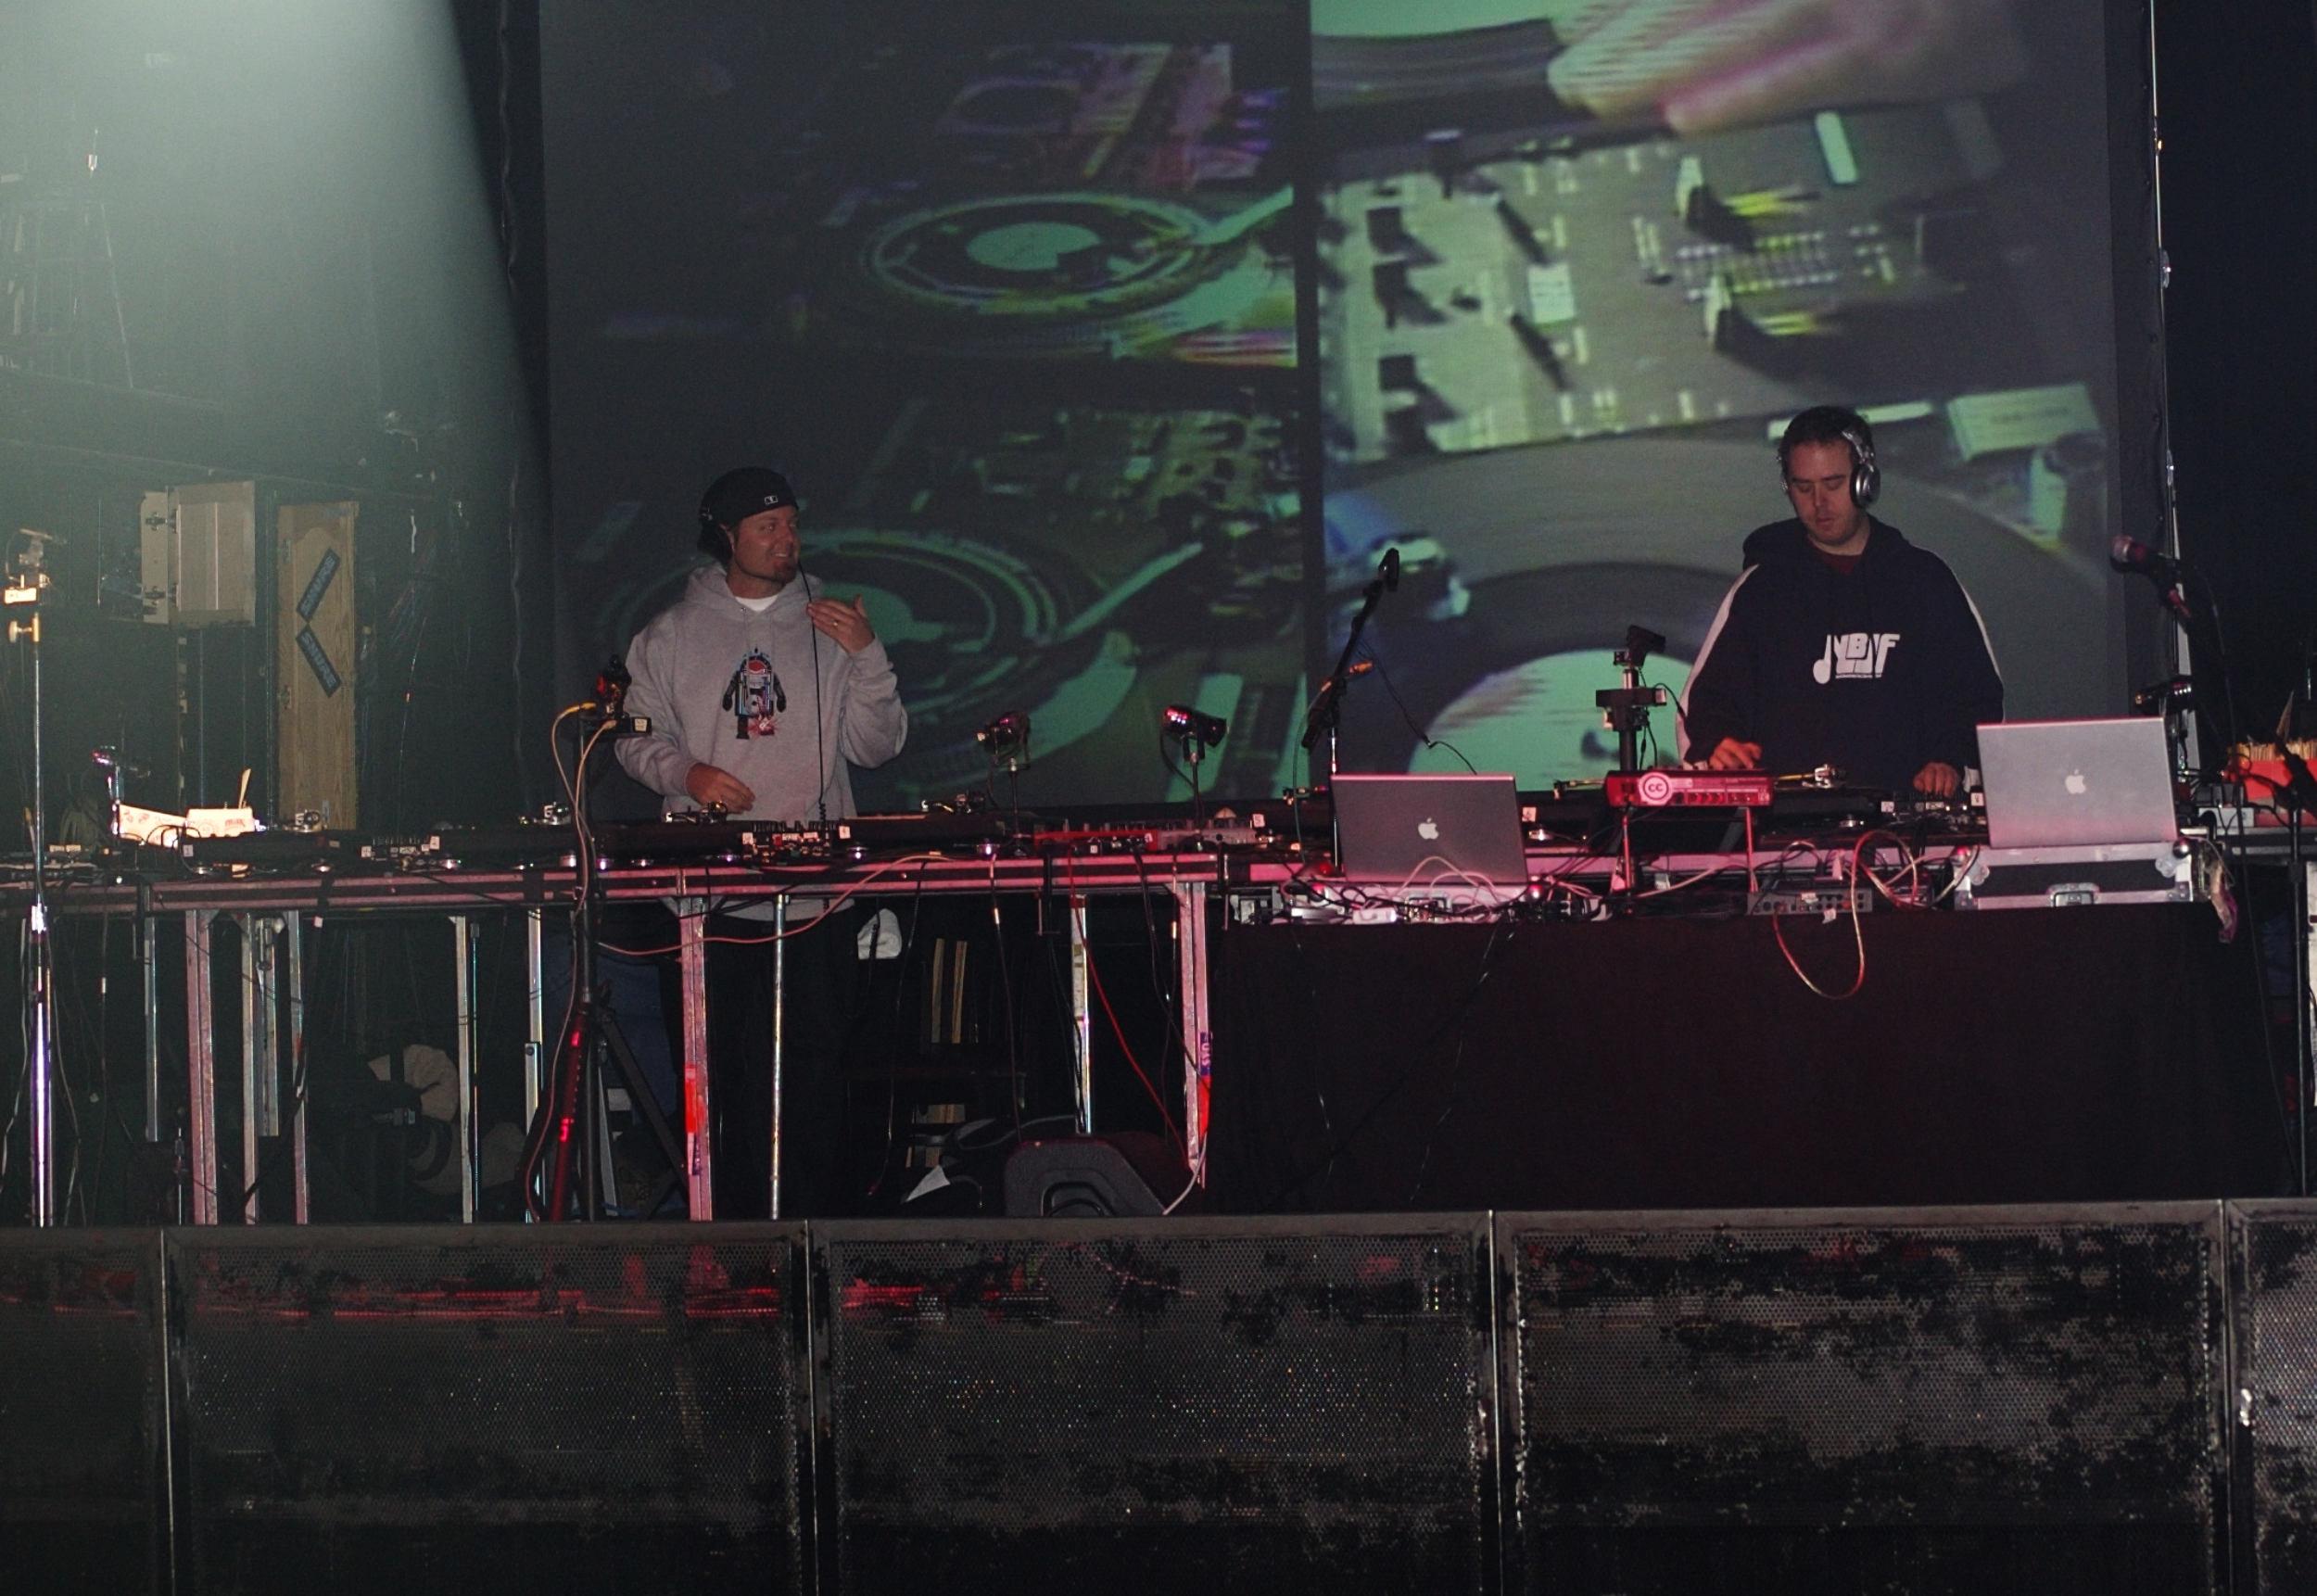 DJ Shadow and Cut Chemist - 2008